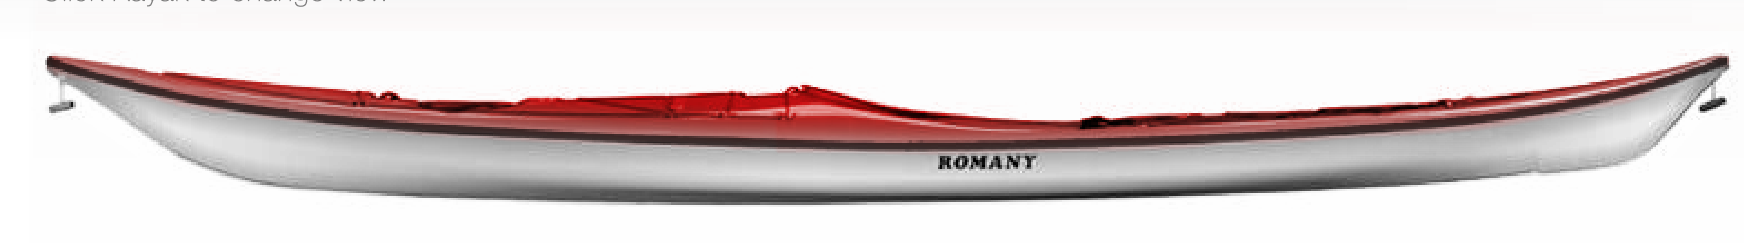 NDK Romany Surf